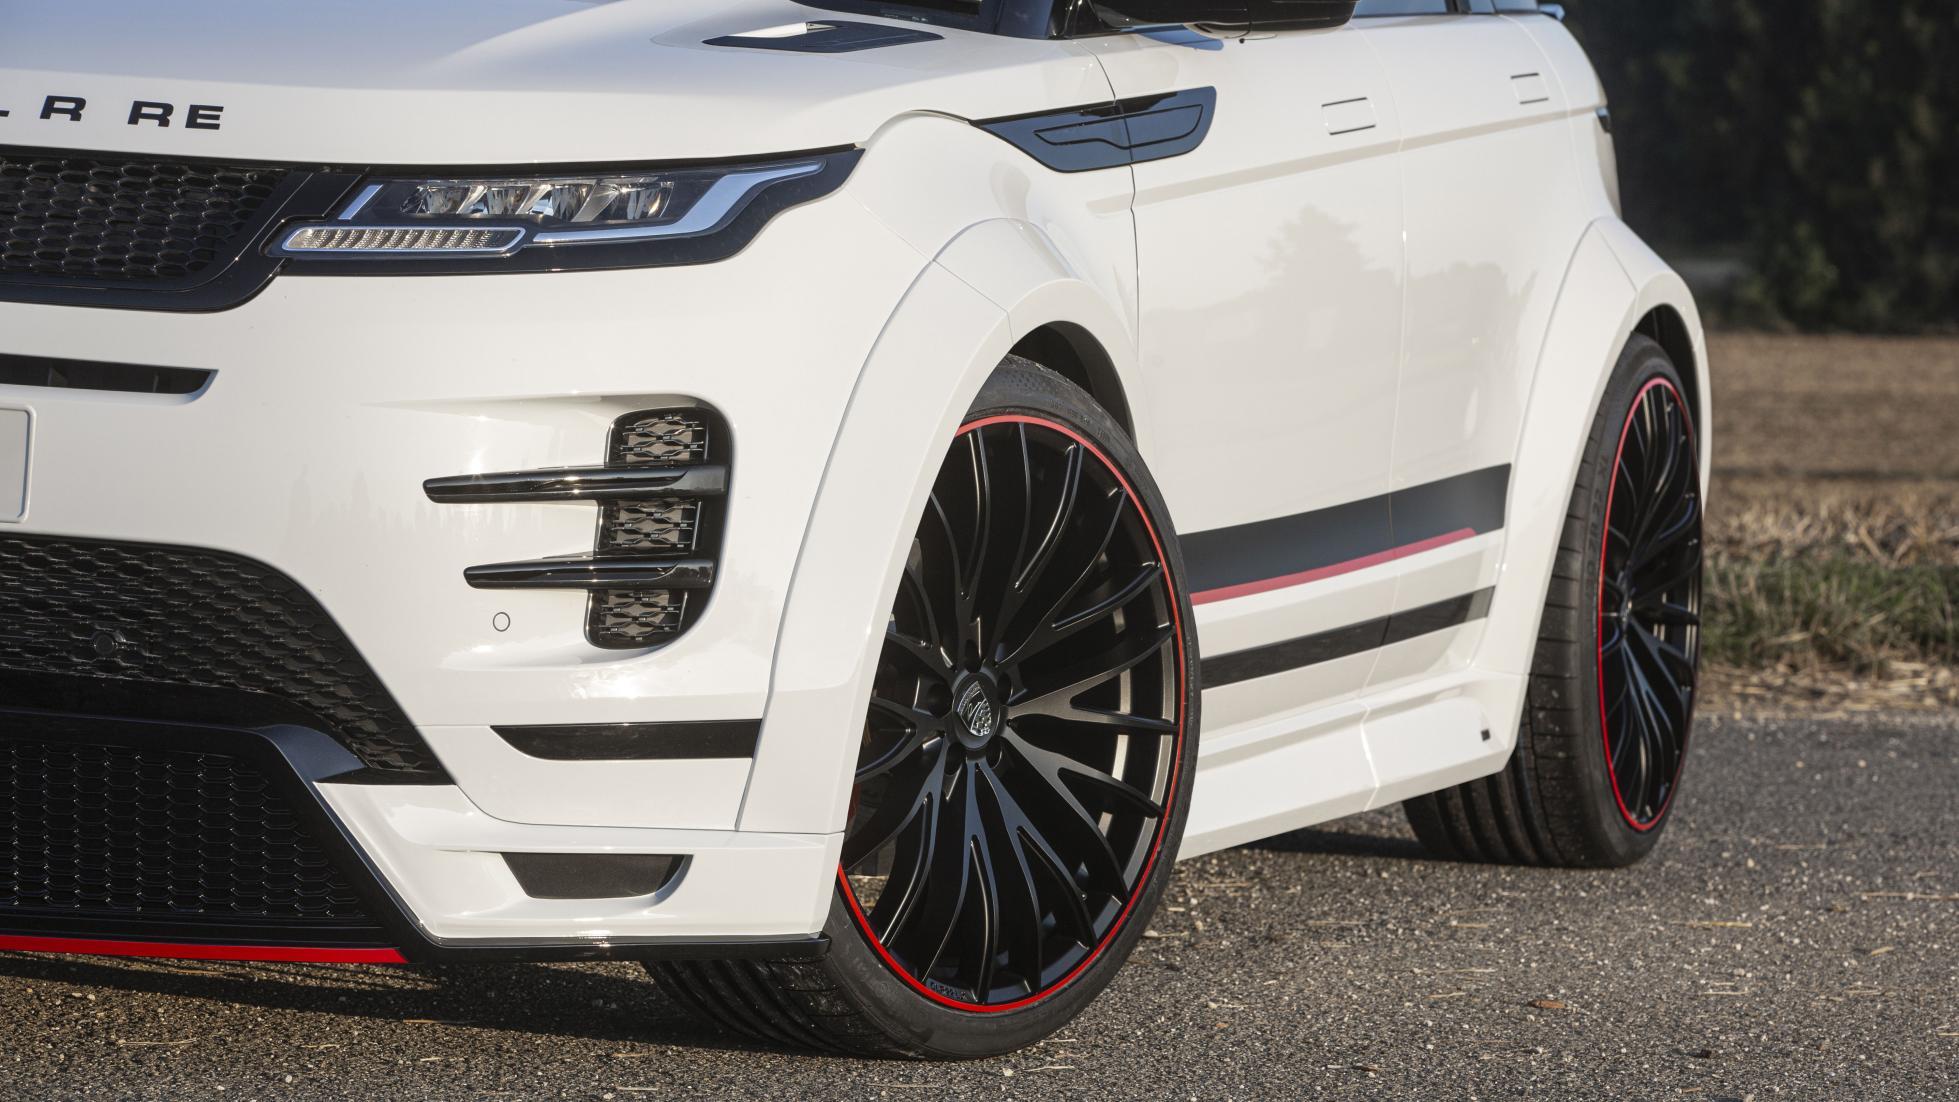 Range-Rover-Evoque-by-Lumma-Design-12